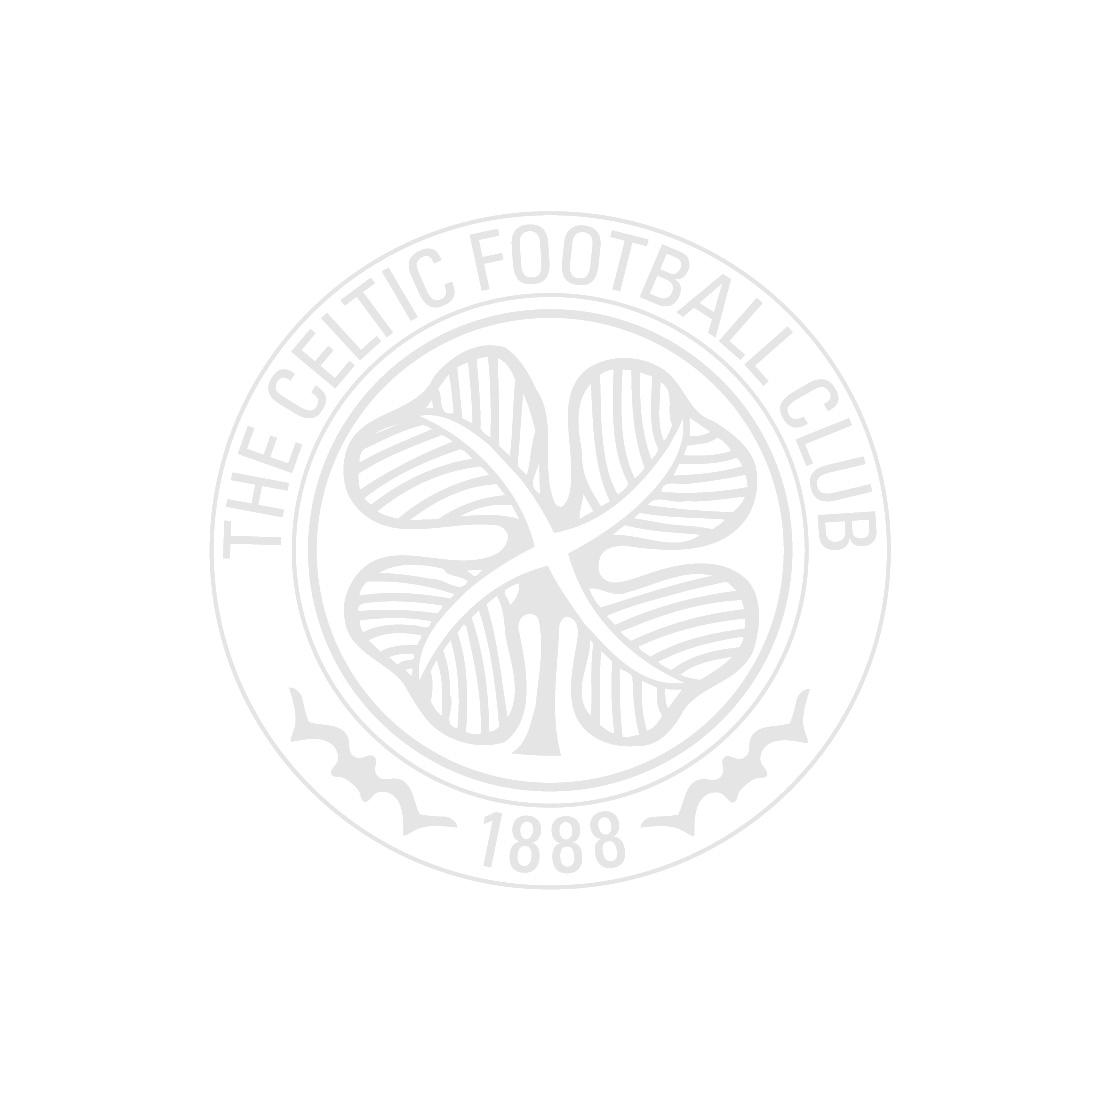 Celtic Raised Rubber 1888 Graphic T-shirt